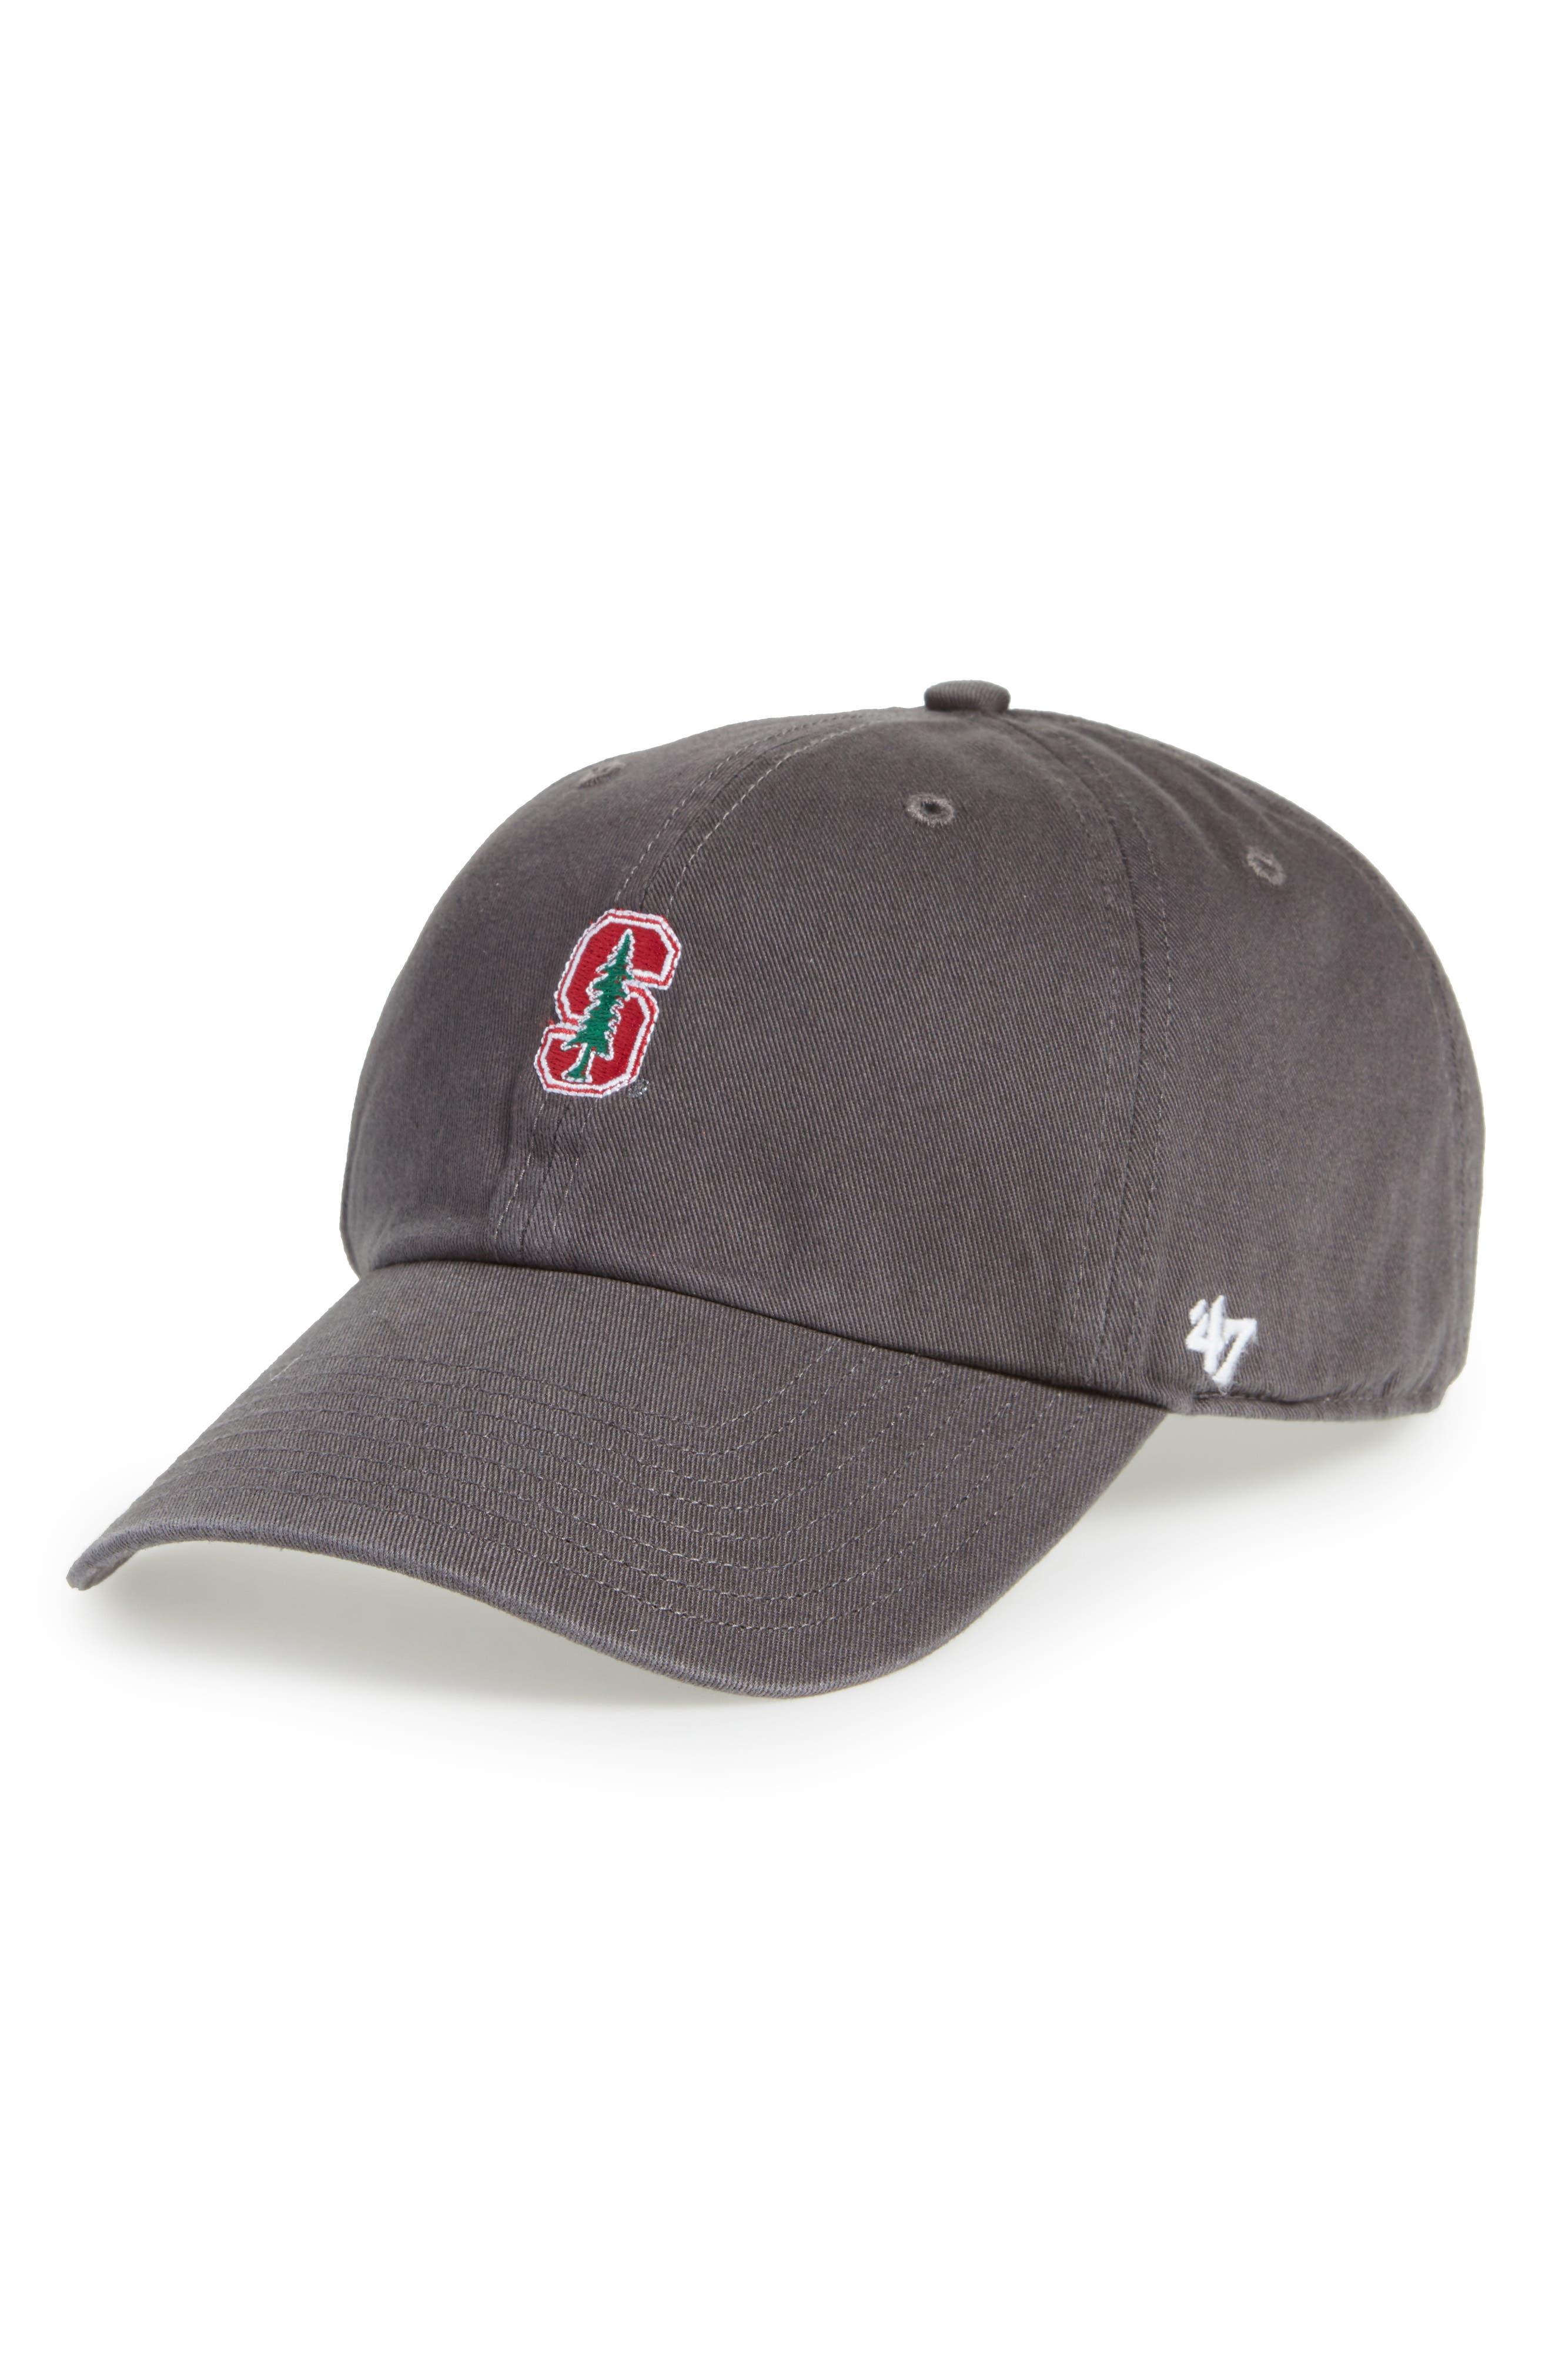 47 Brand Collegiate Clean-Up Stanford Cardinals Ball Cap